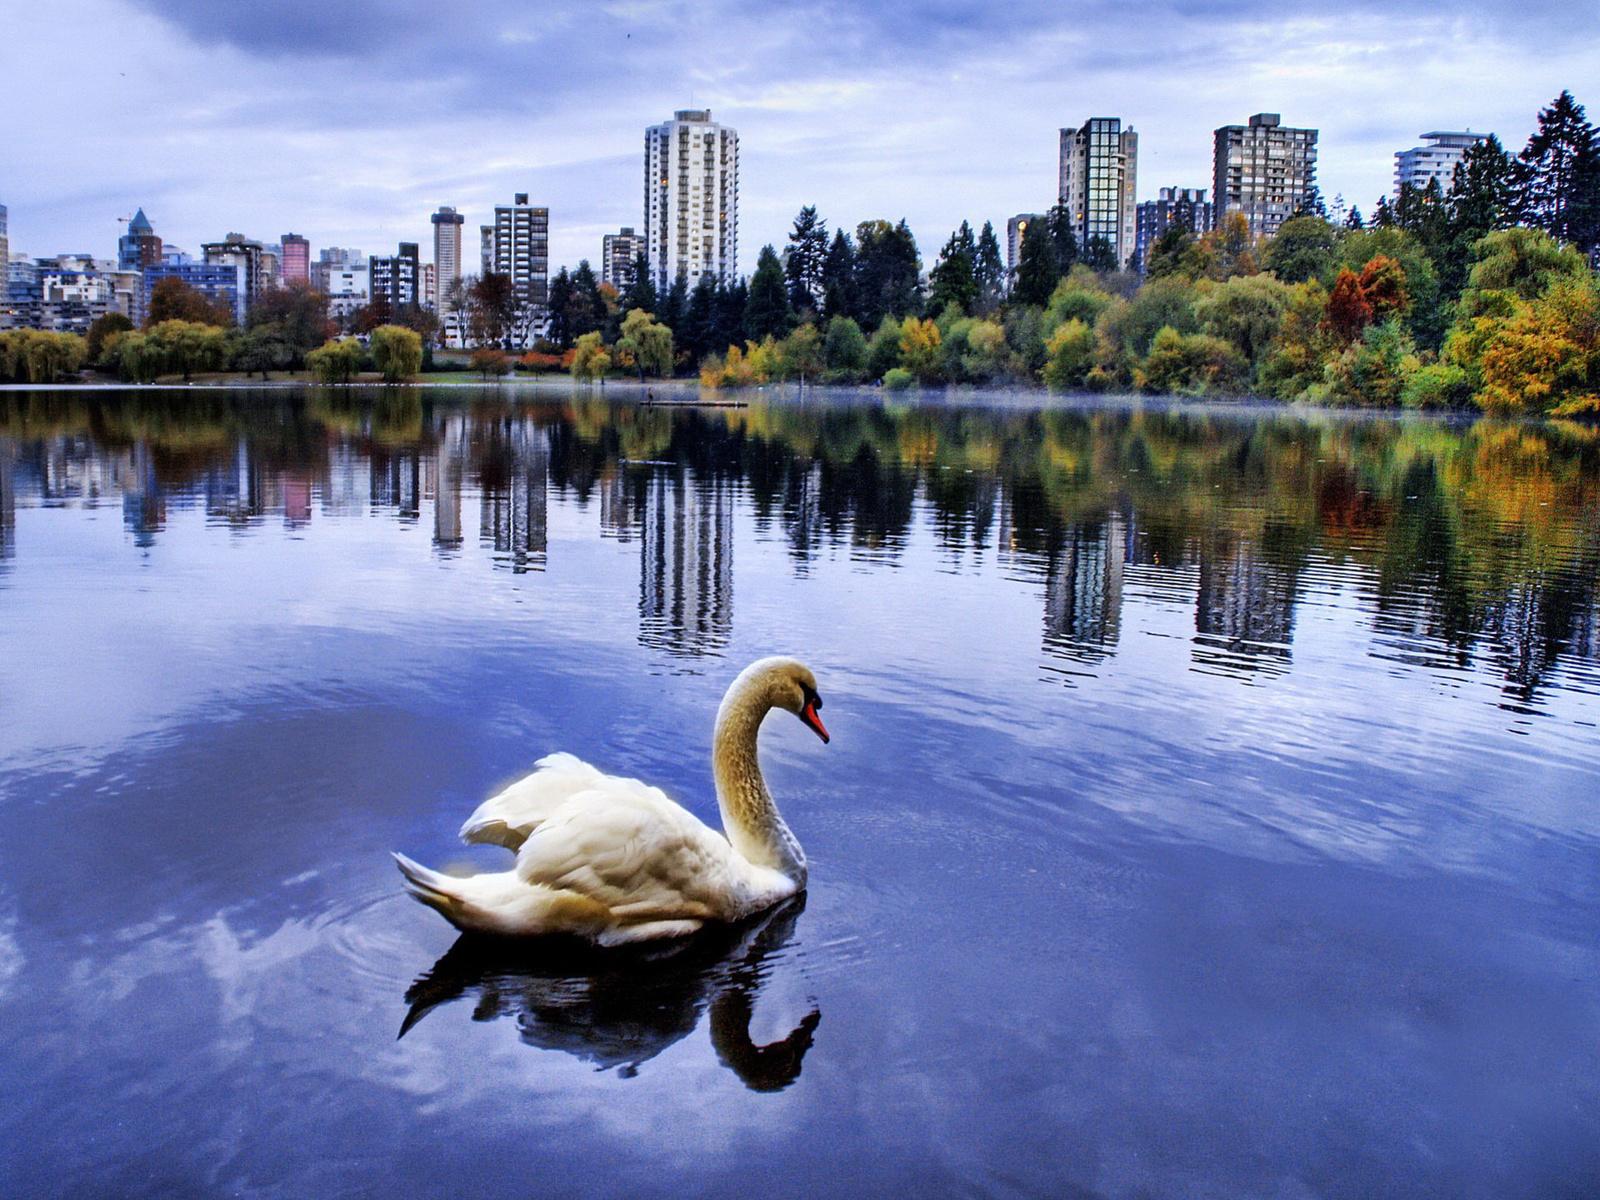 Самара: обыкновенная история обыкновенного озера. самара